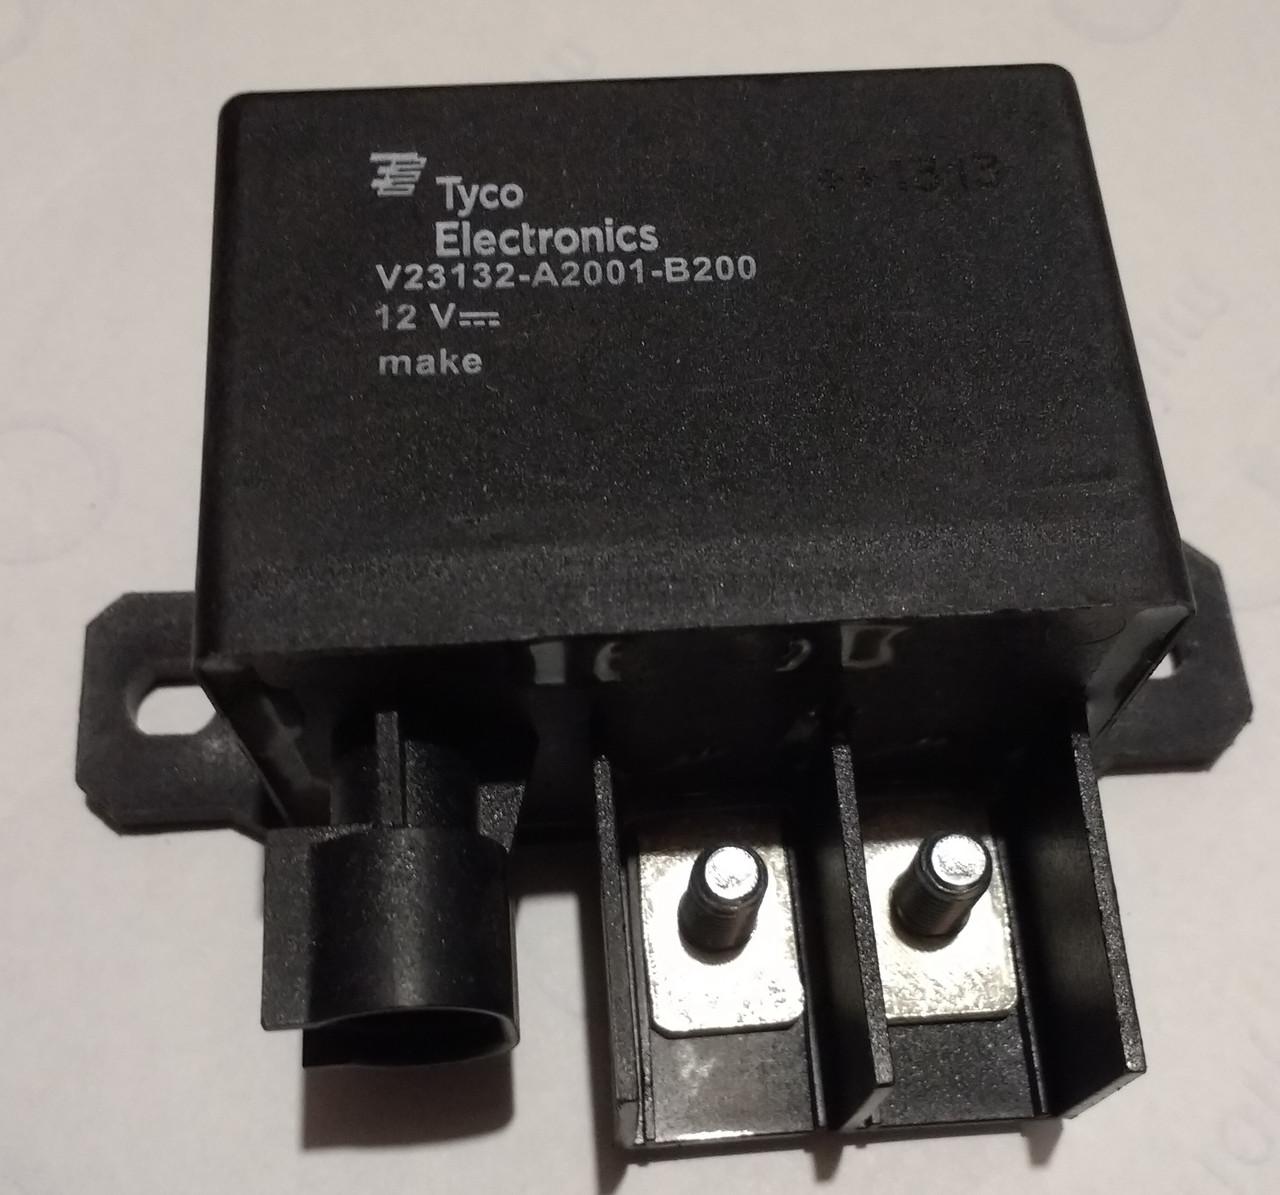 Реле предпускового подогрева двигателя 12V /TE Connectivity /TYCO/ Швейцария/